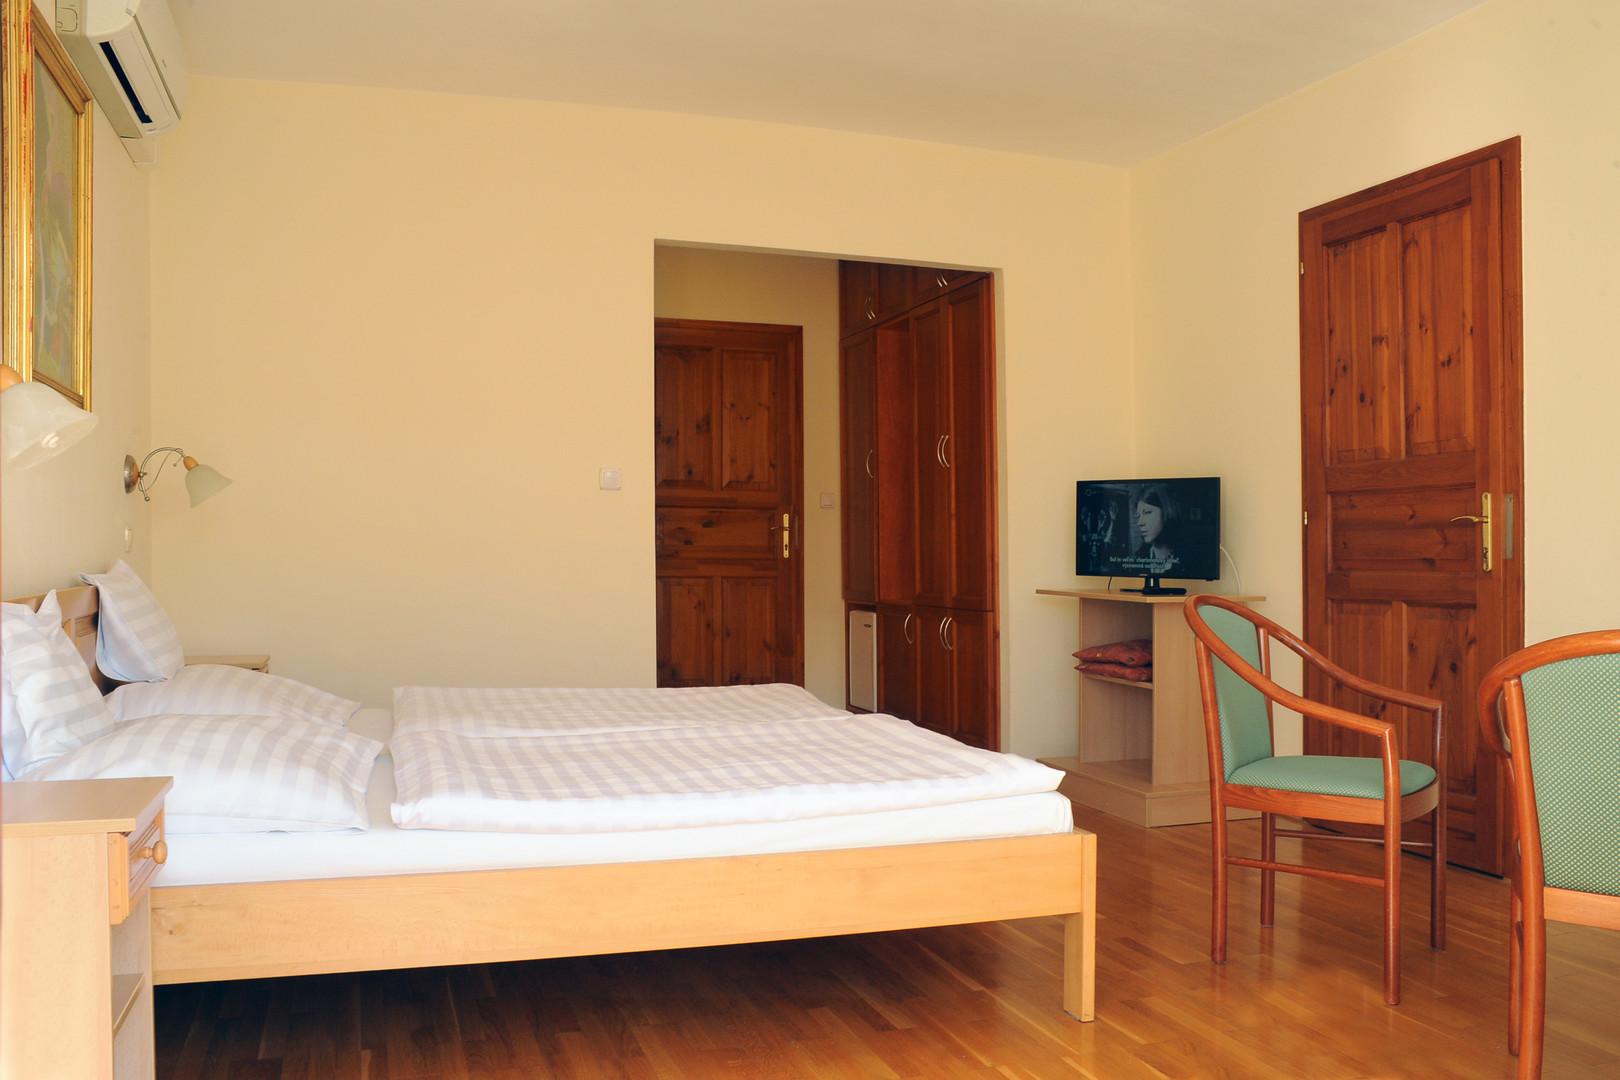 Hotel Ametiszt #4